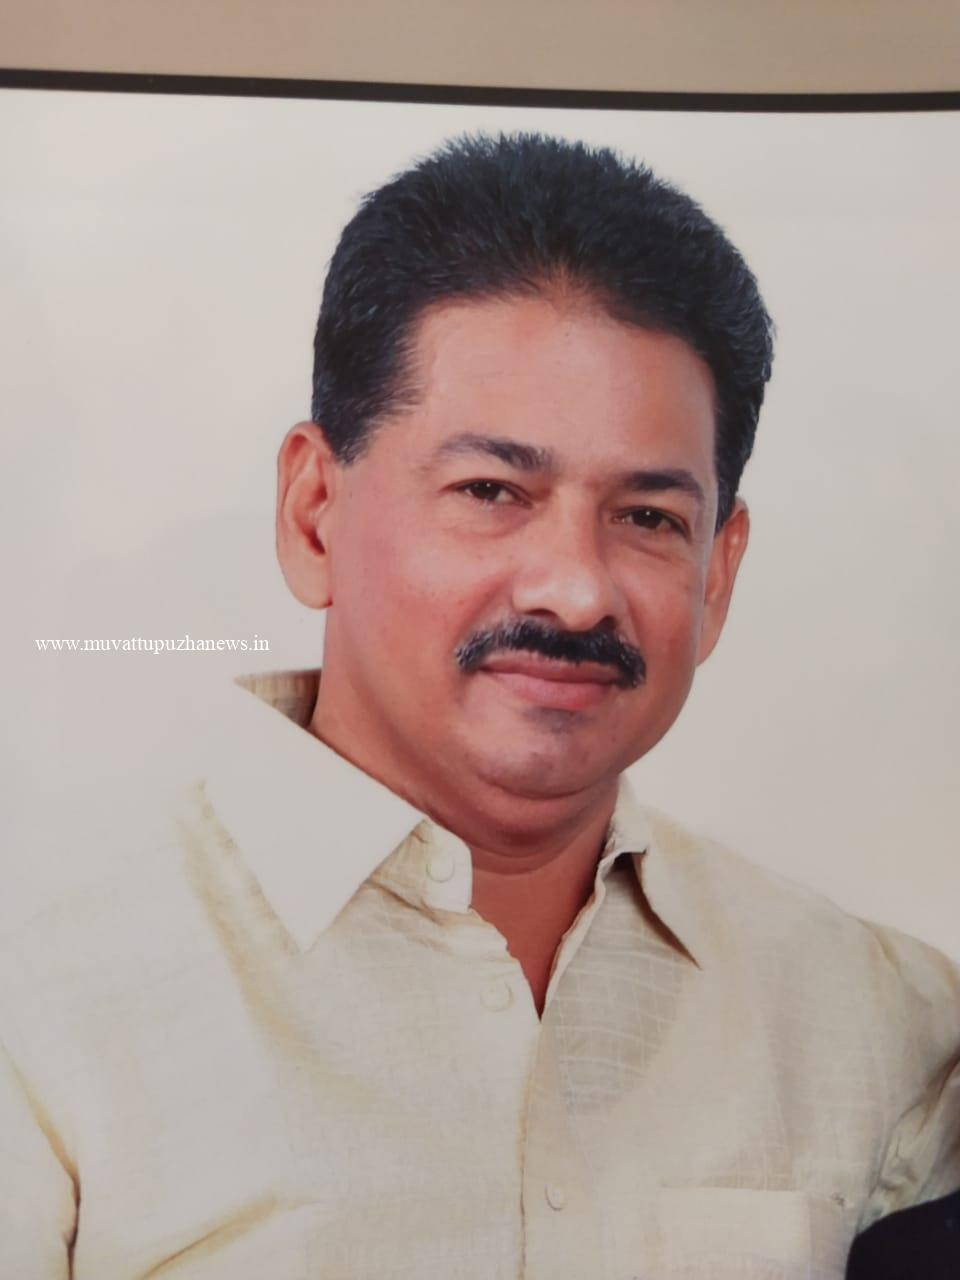 Photo of ഷാലിമാർ ഹോട്ടൽ ഉടമ ഷംസുദ്ദീൻ (53)  അന്തരിച്ചു .